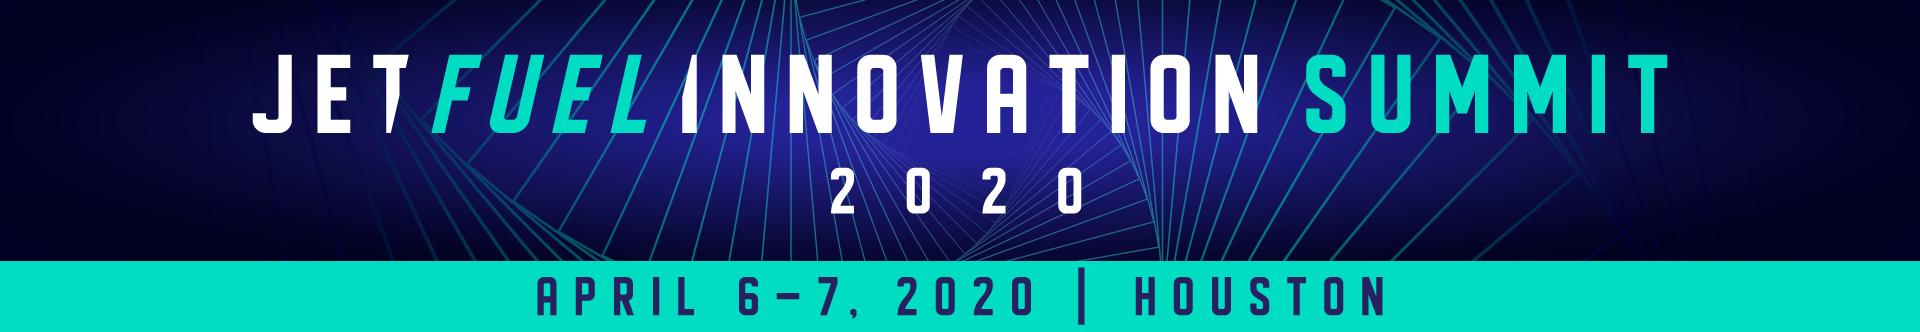 Jet Fuel Innovation Summit